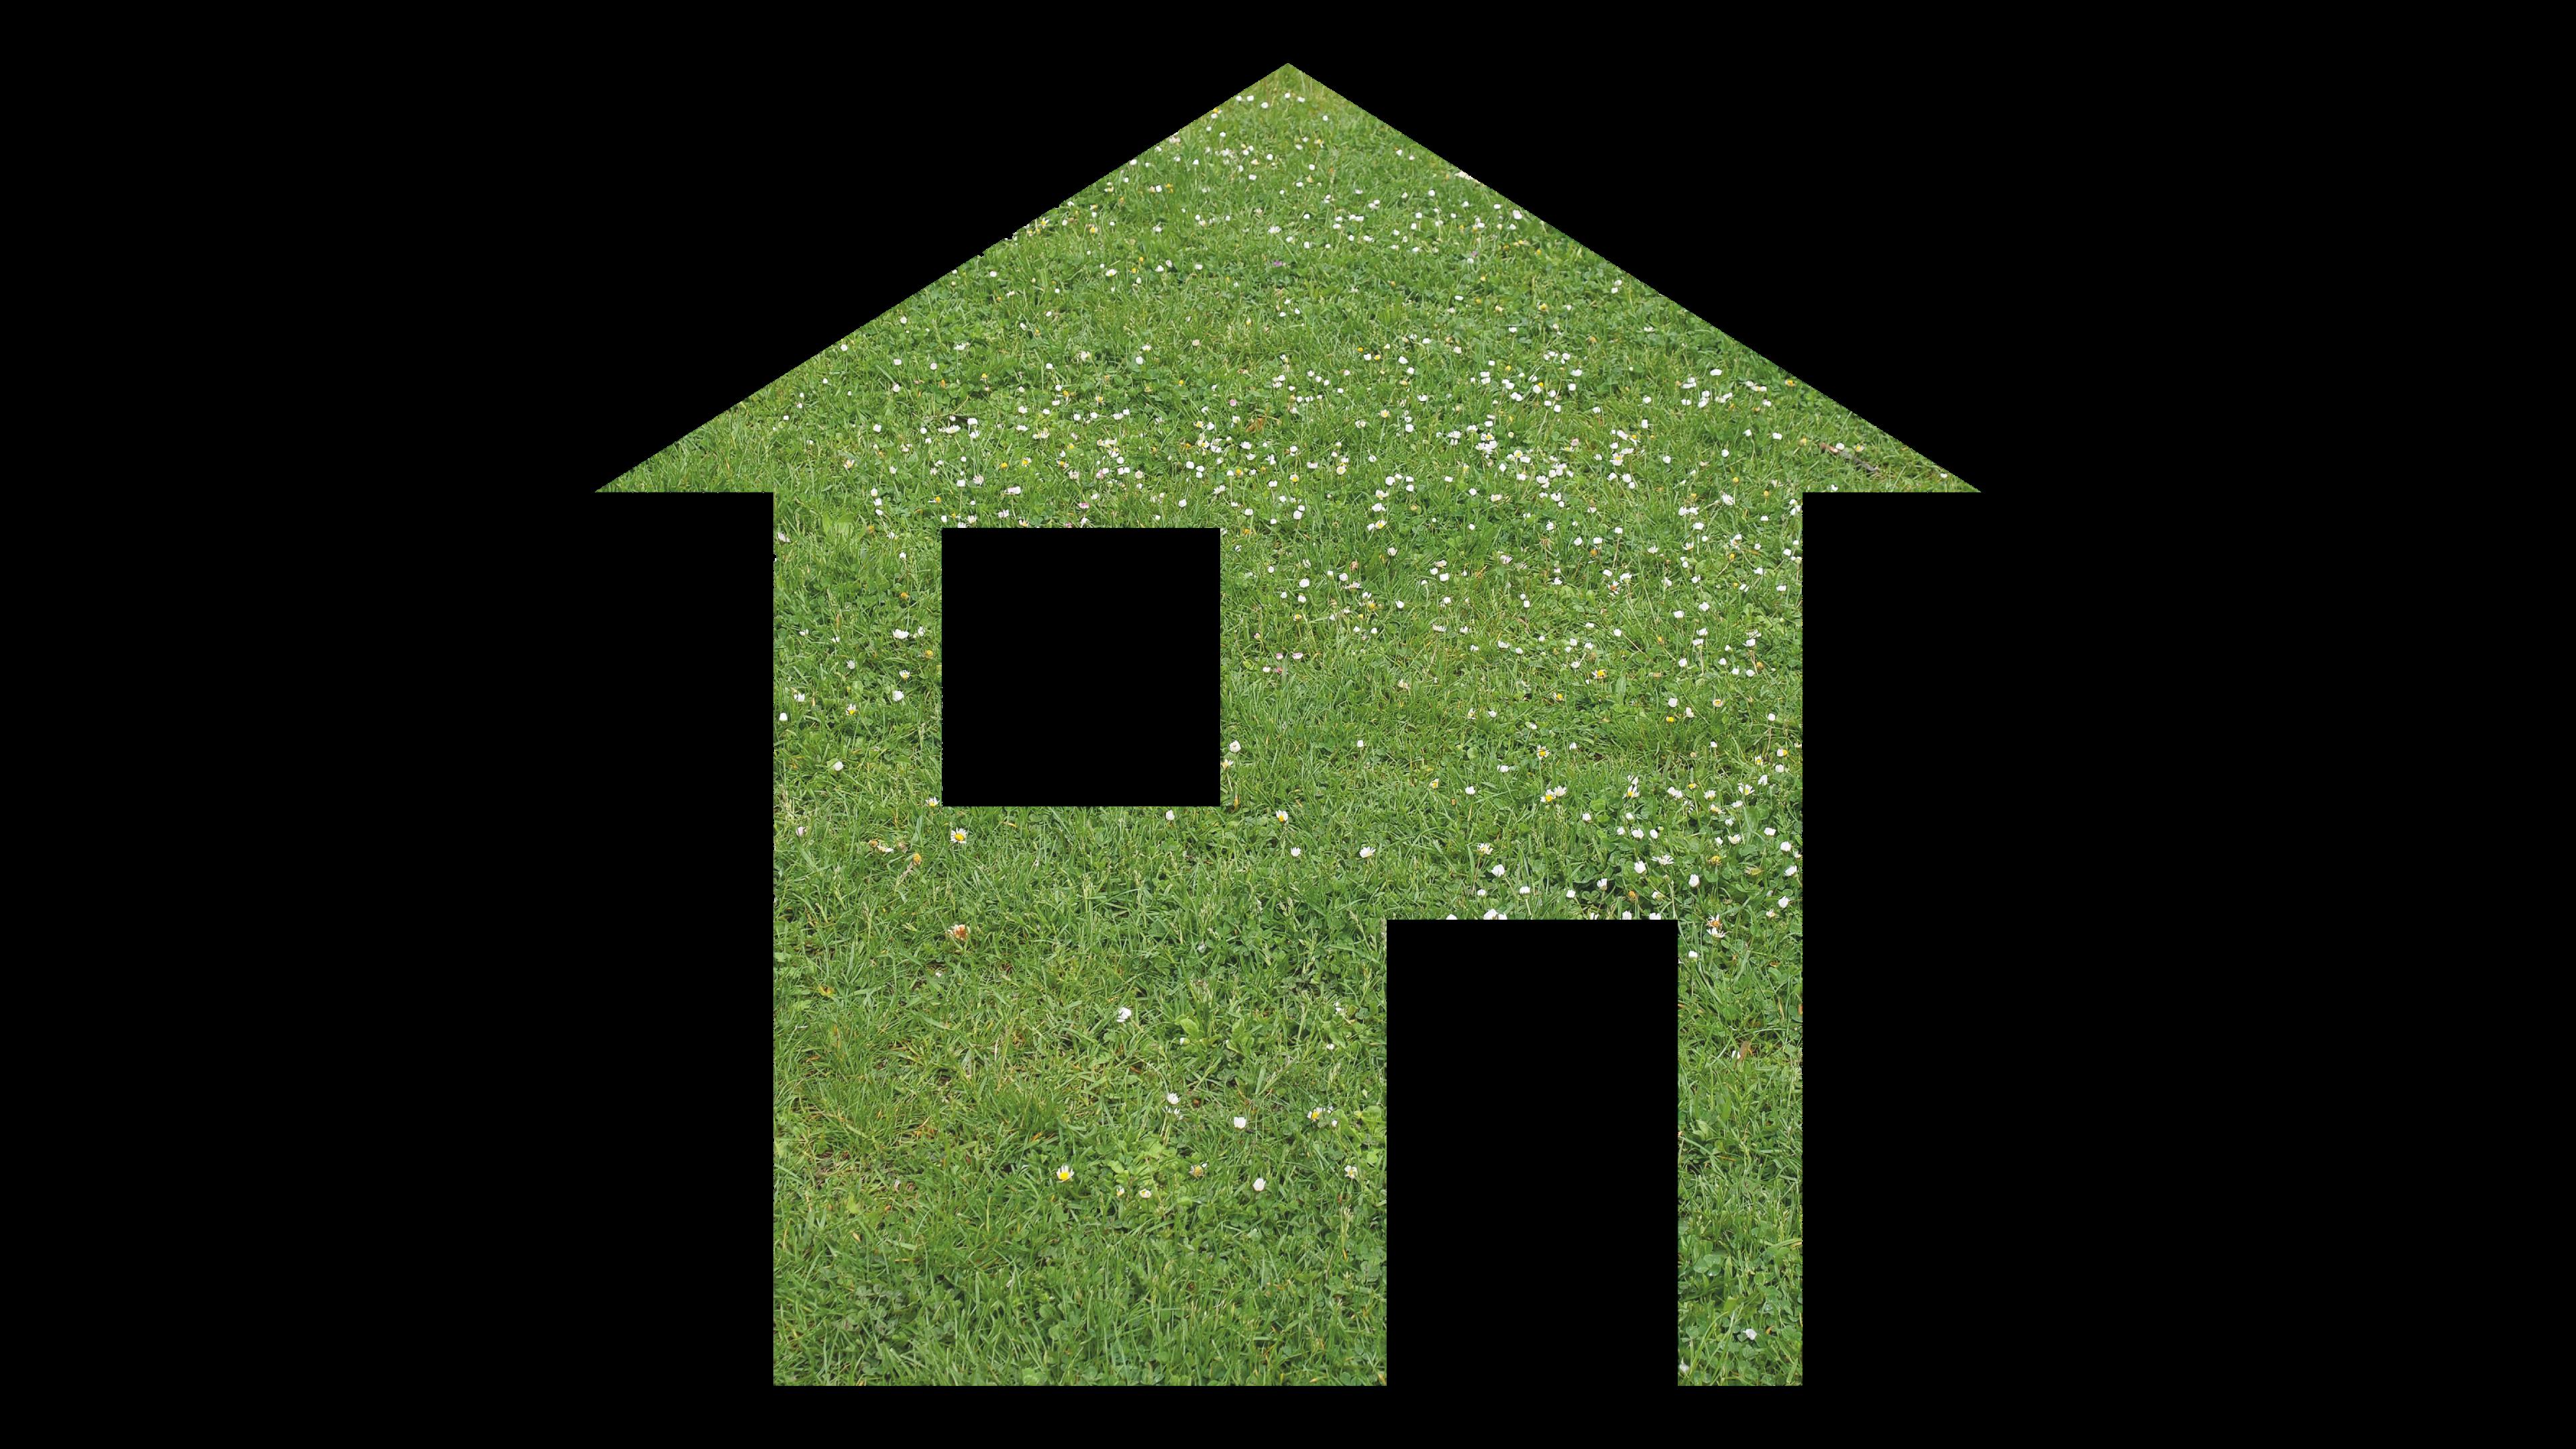 NJ Foreclosure Rescue   Foreclosure Options in New Jersey   Pre-Foreclosure in NJ   Avoiding Foreclosure in New Jersey   Best Way to Prevent Foreclosure in NJ   Ways to Stop Foreclosure Immediately in New Jersey   Loans to Stop Foreclosure in NJ   Preventing Foreclosure in New Jersey